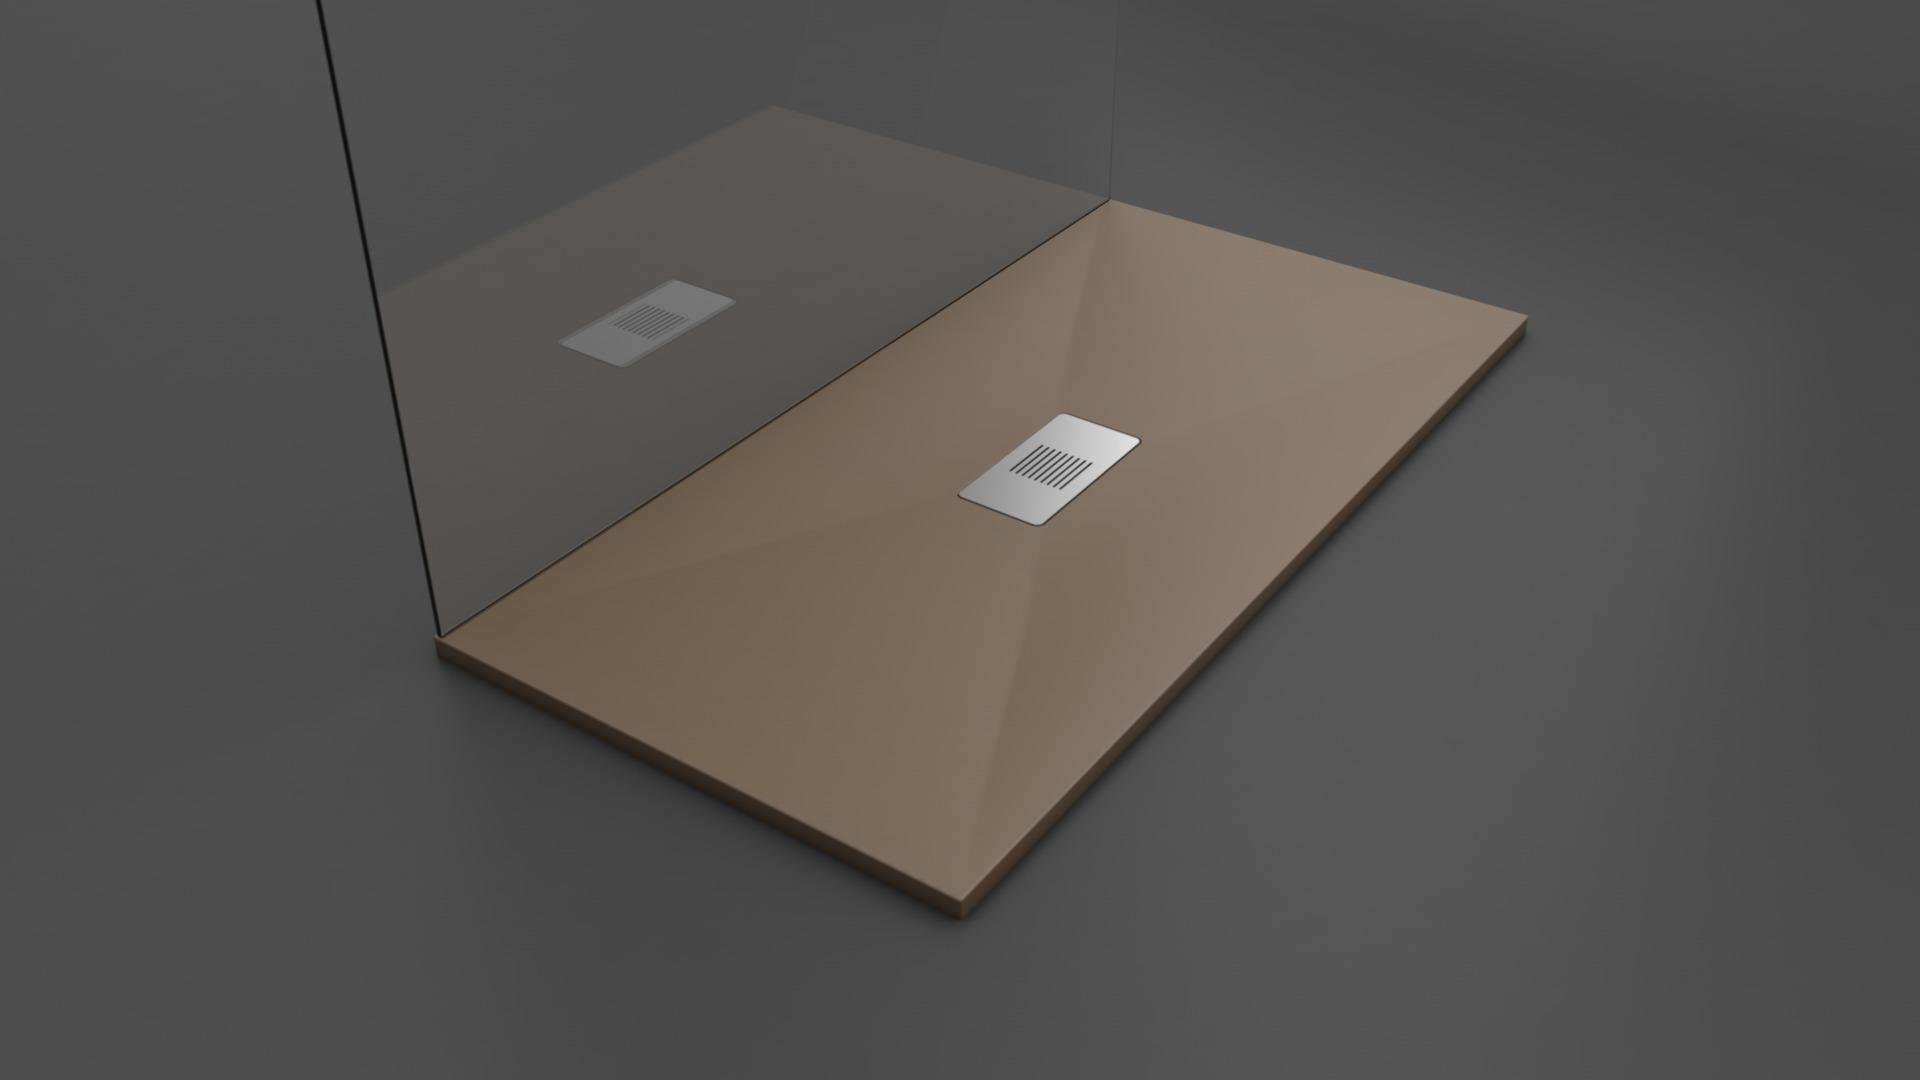 Texence Double Center Square - Plato de ducha color marrón